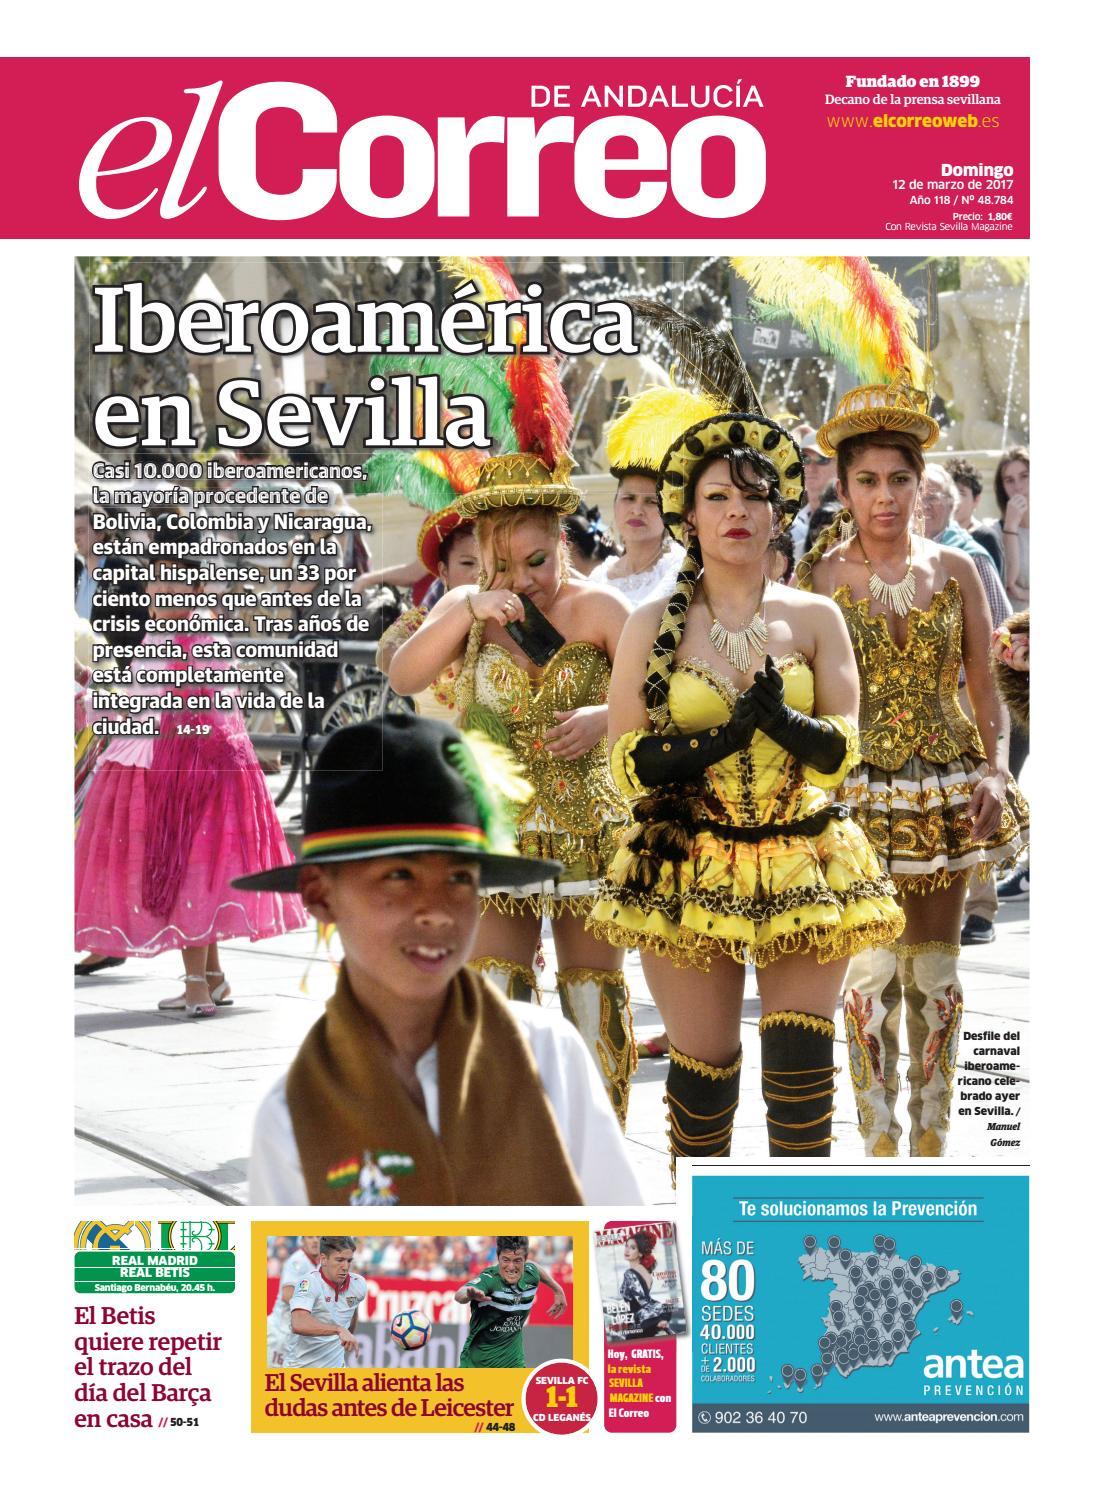 12 03 2017 El Correo de Andalucía by EL CORREO DE ANDALUCÍA S.L. - issuu e6b77213942